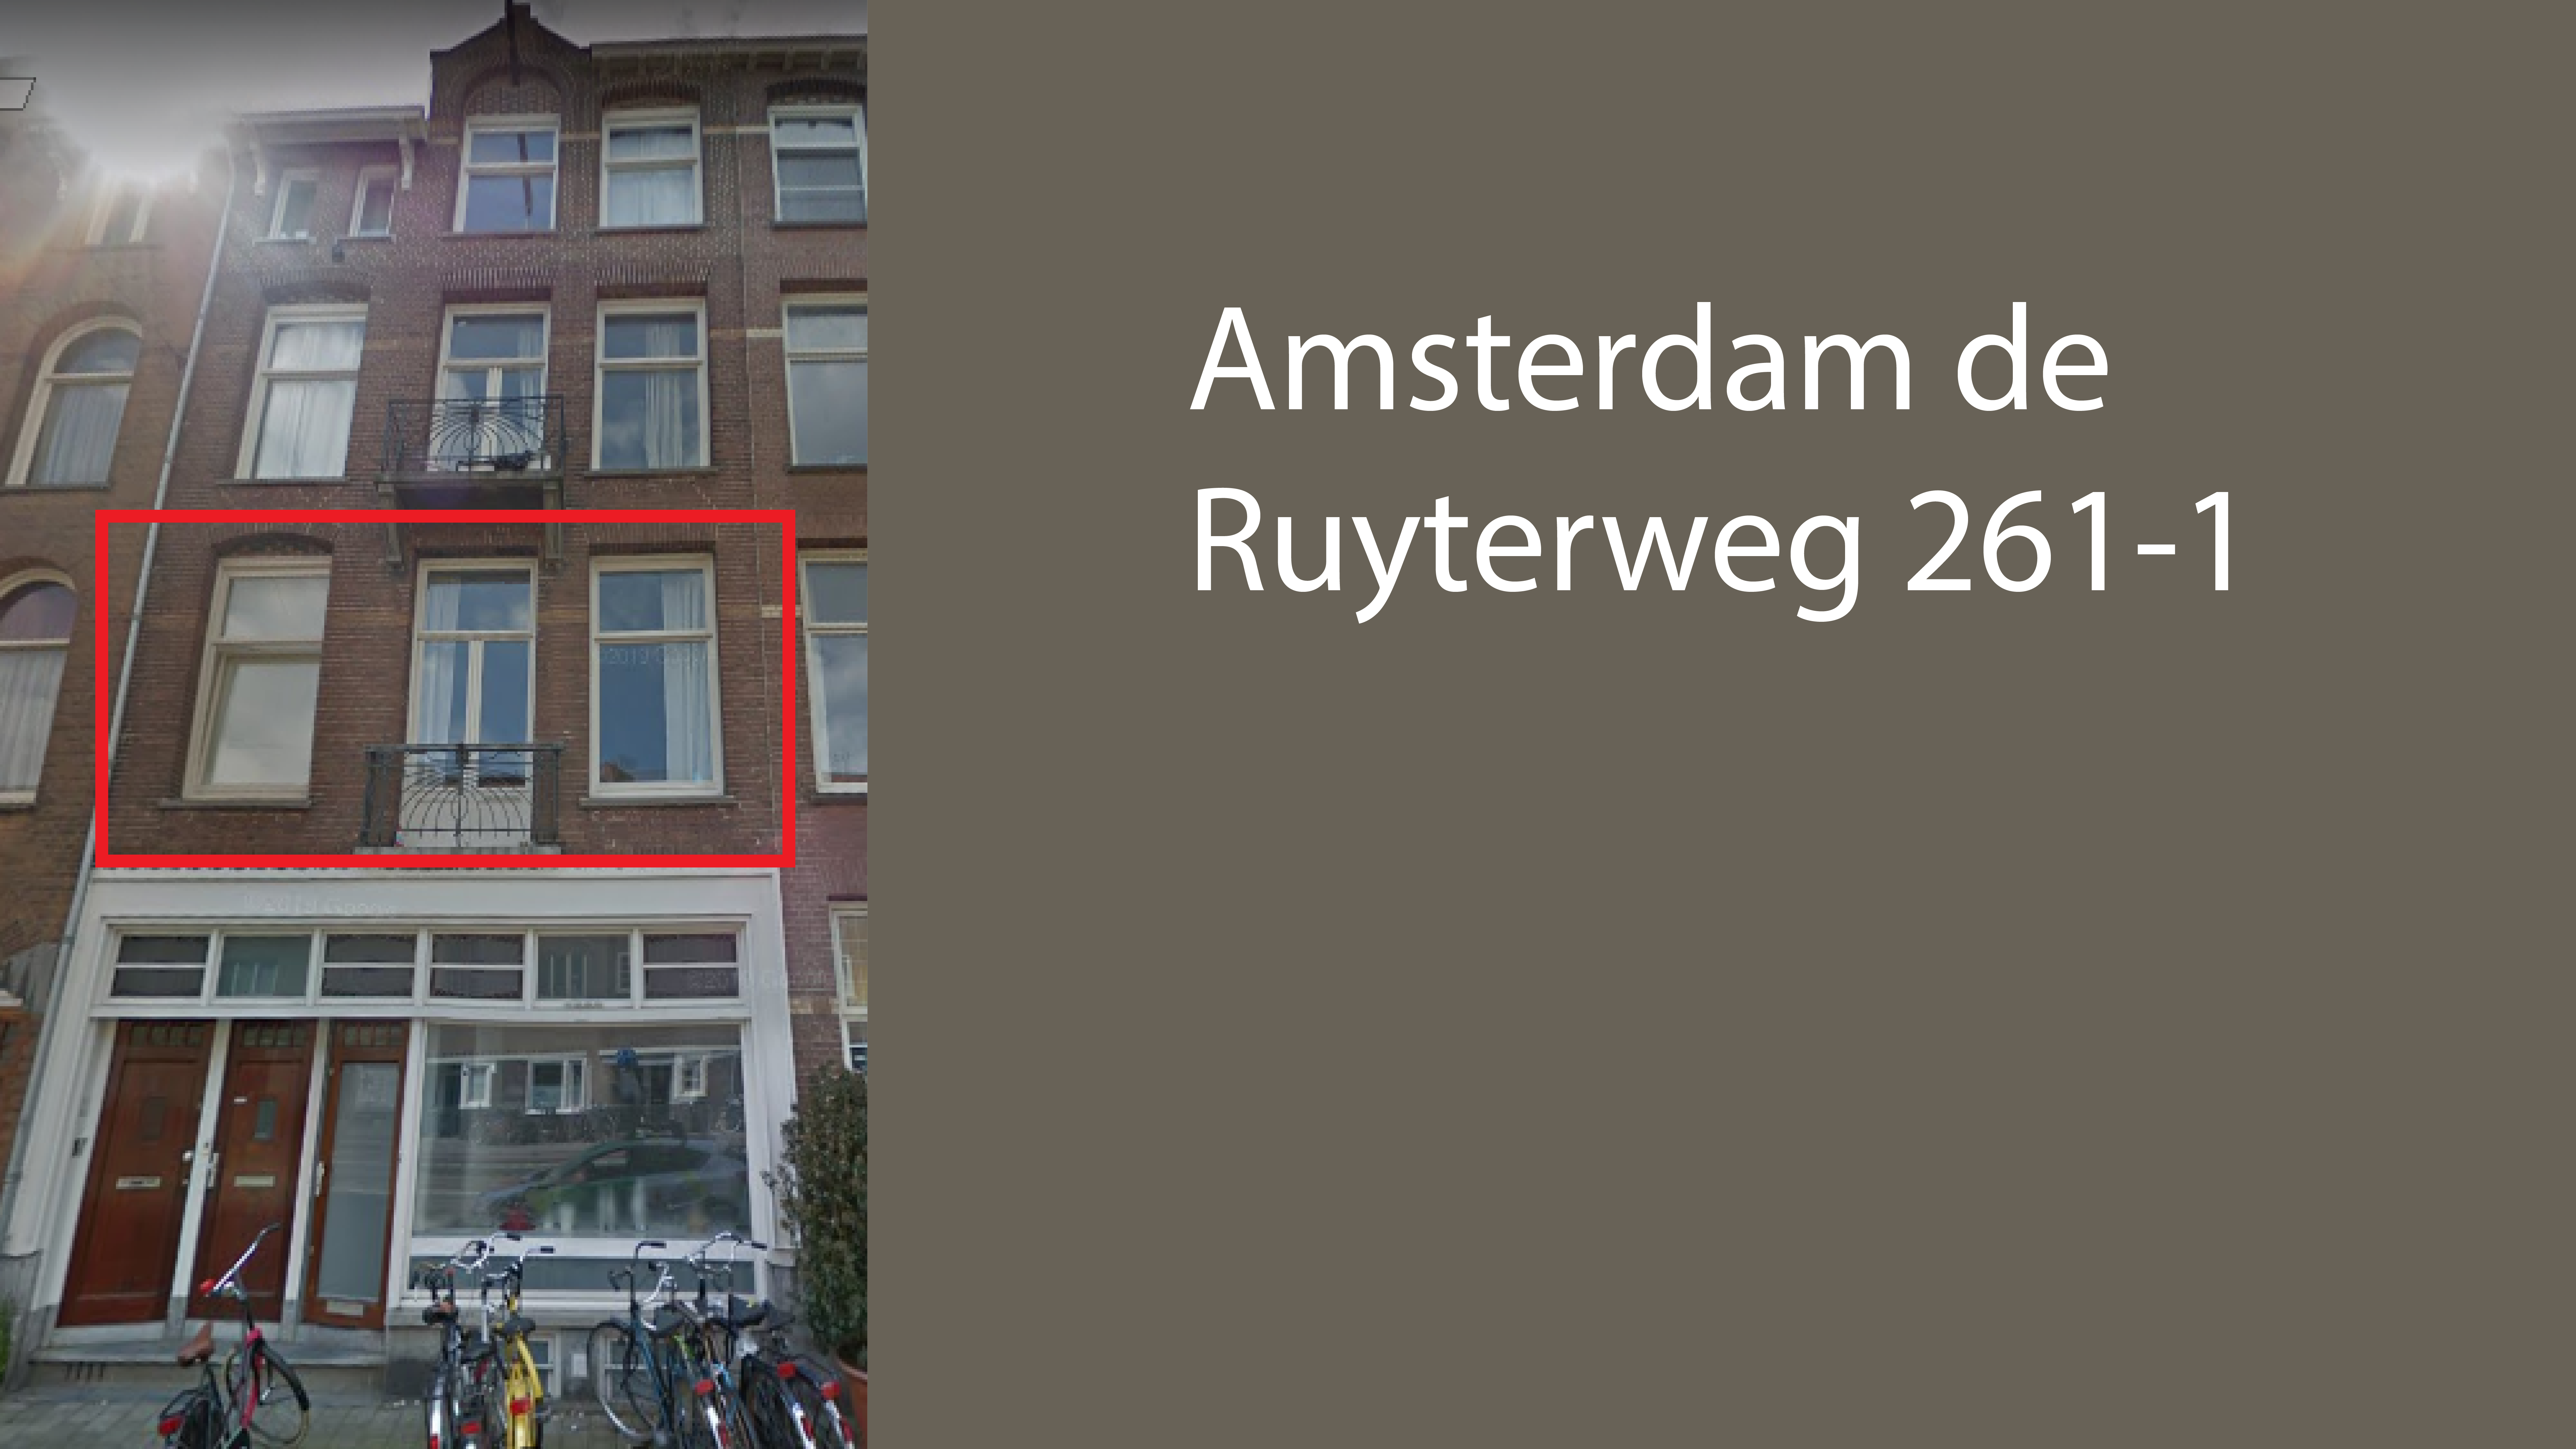 Amsterdam de Ruyterweg 261-1